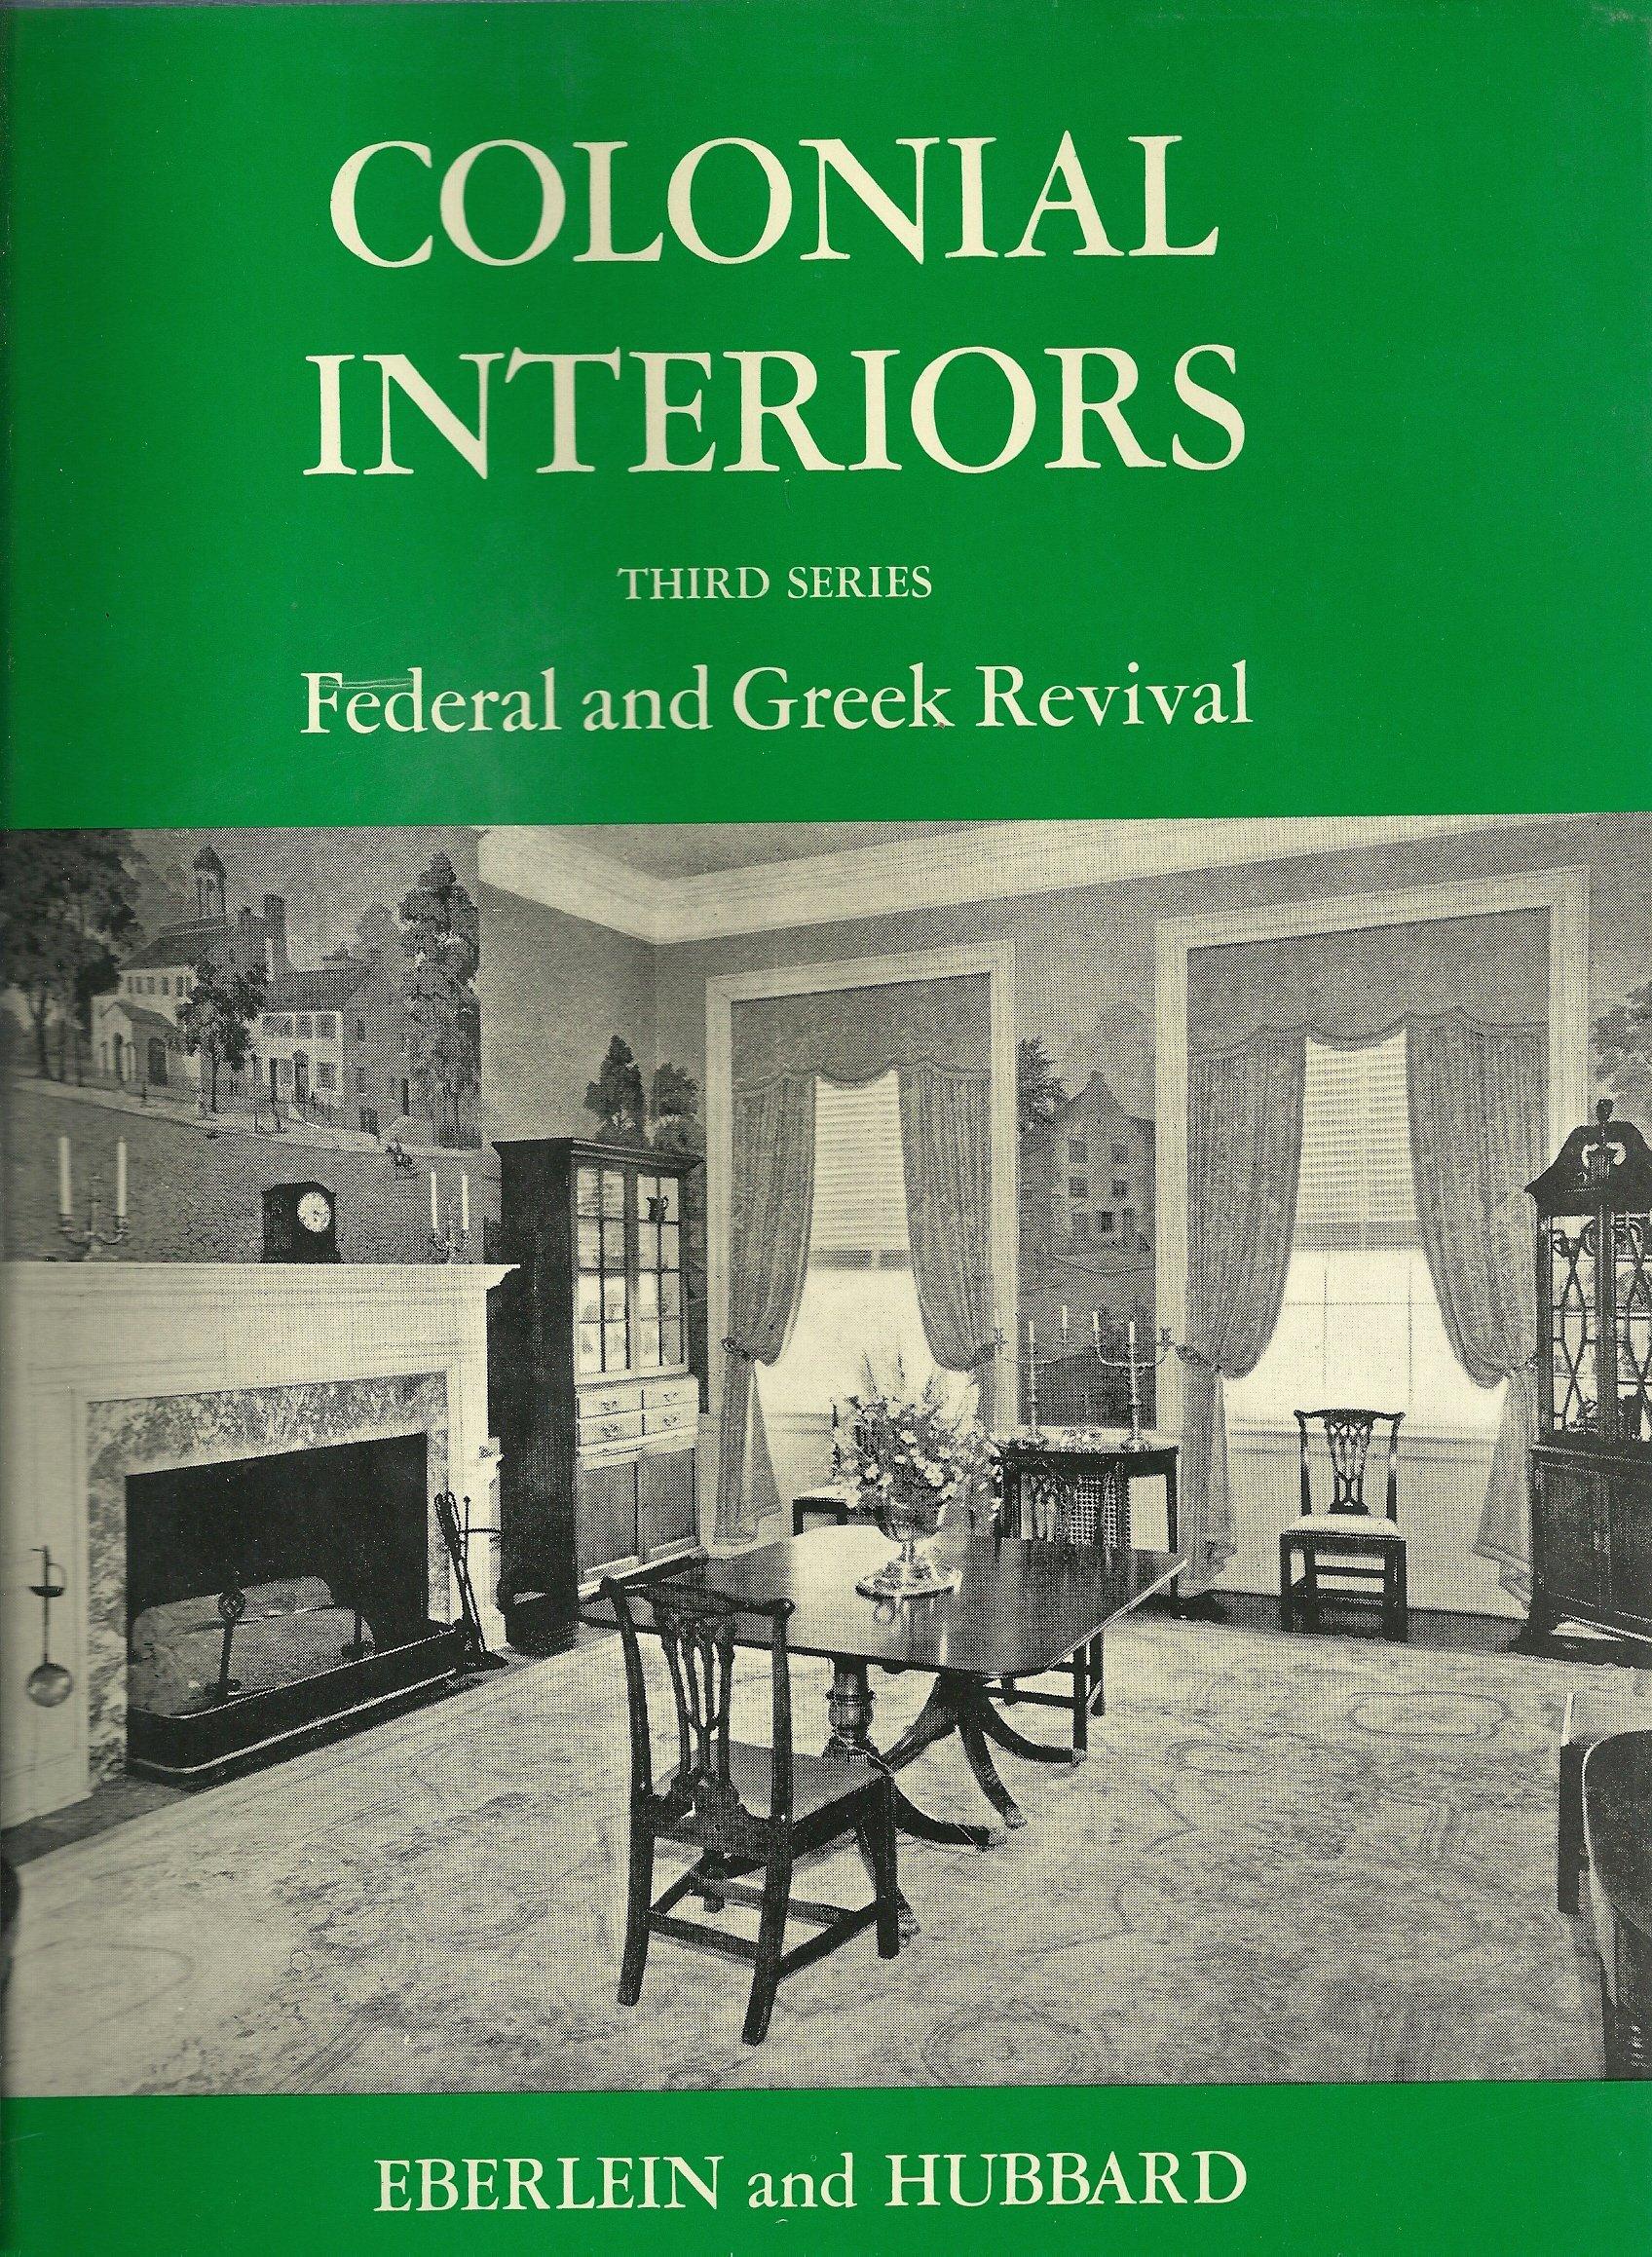 Colonial Interiors Federal and Greek Revival: Harold Donaldson Eberlein and Courtlandt Van Dyke Hubbard.: Amazon.com: Books & Colonial Interiors Federal and Greek Revival: Harold Donaldson ...